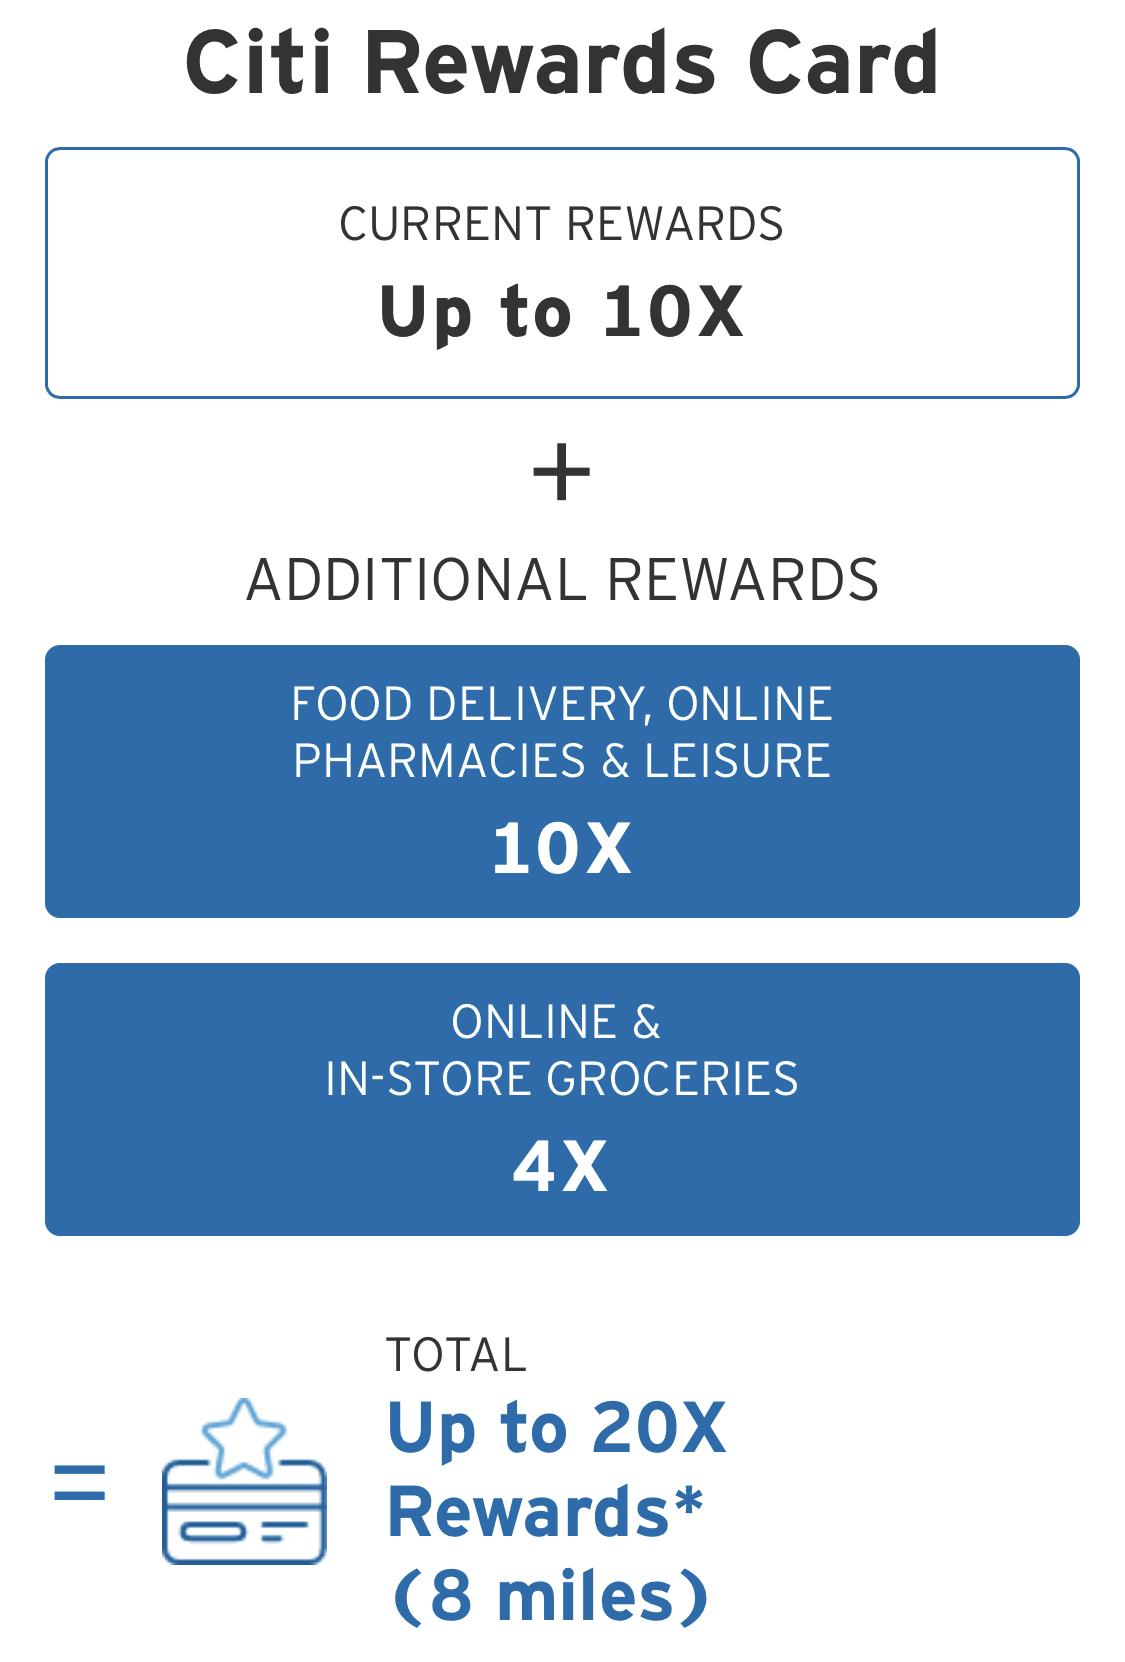 Citi Rewards Offer